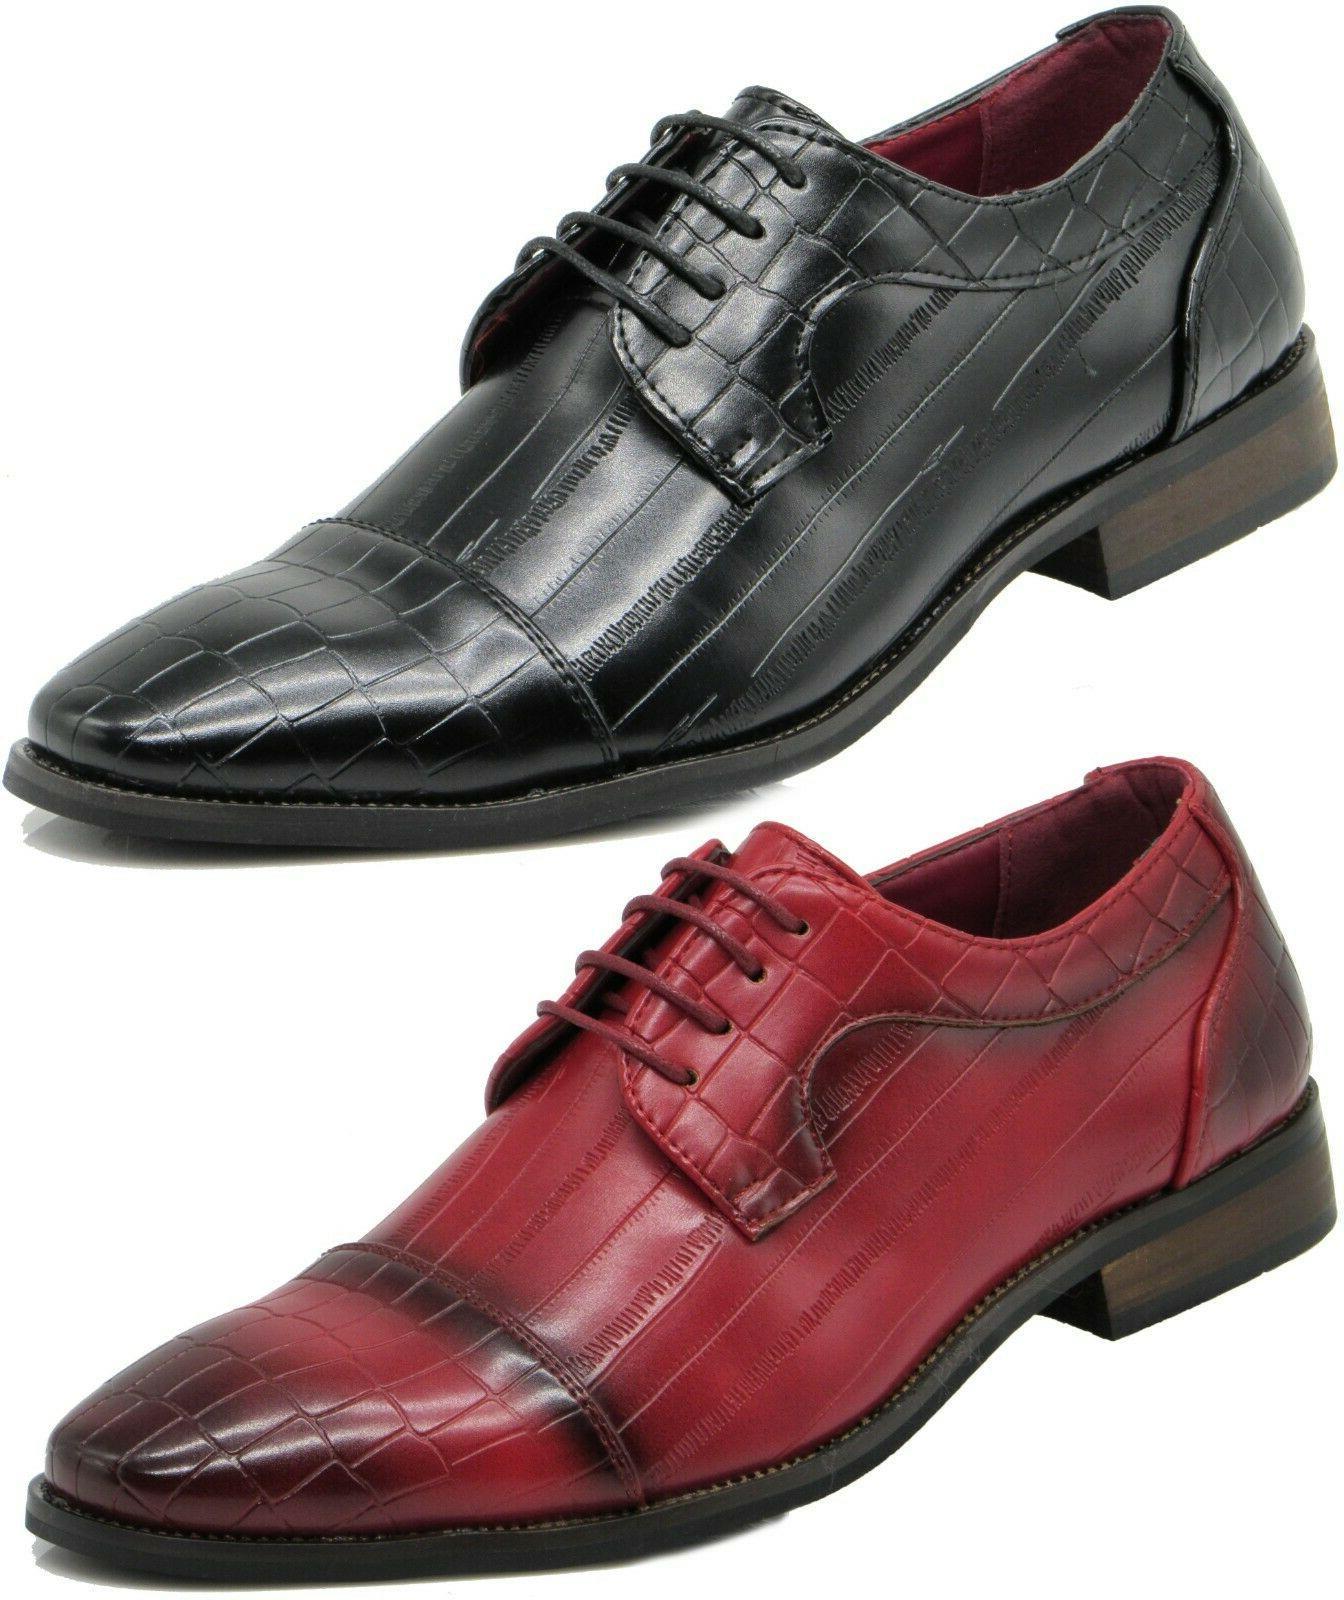 men dress shoes crocodile print oxford leather